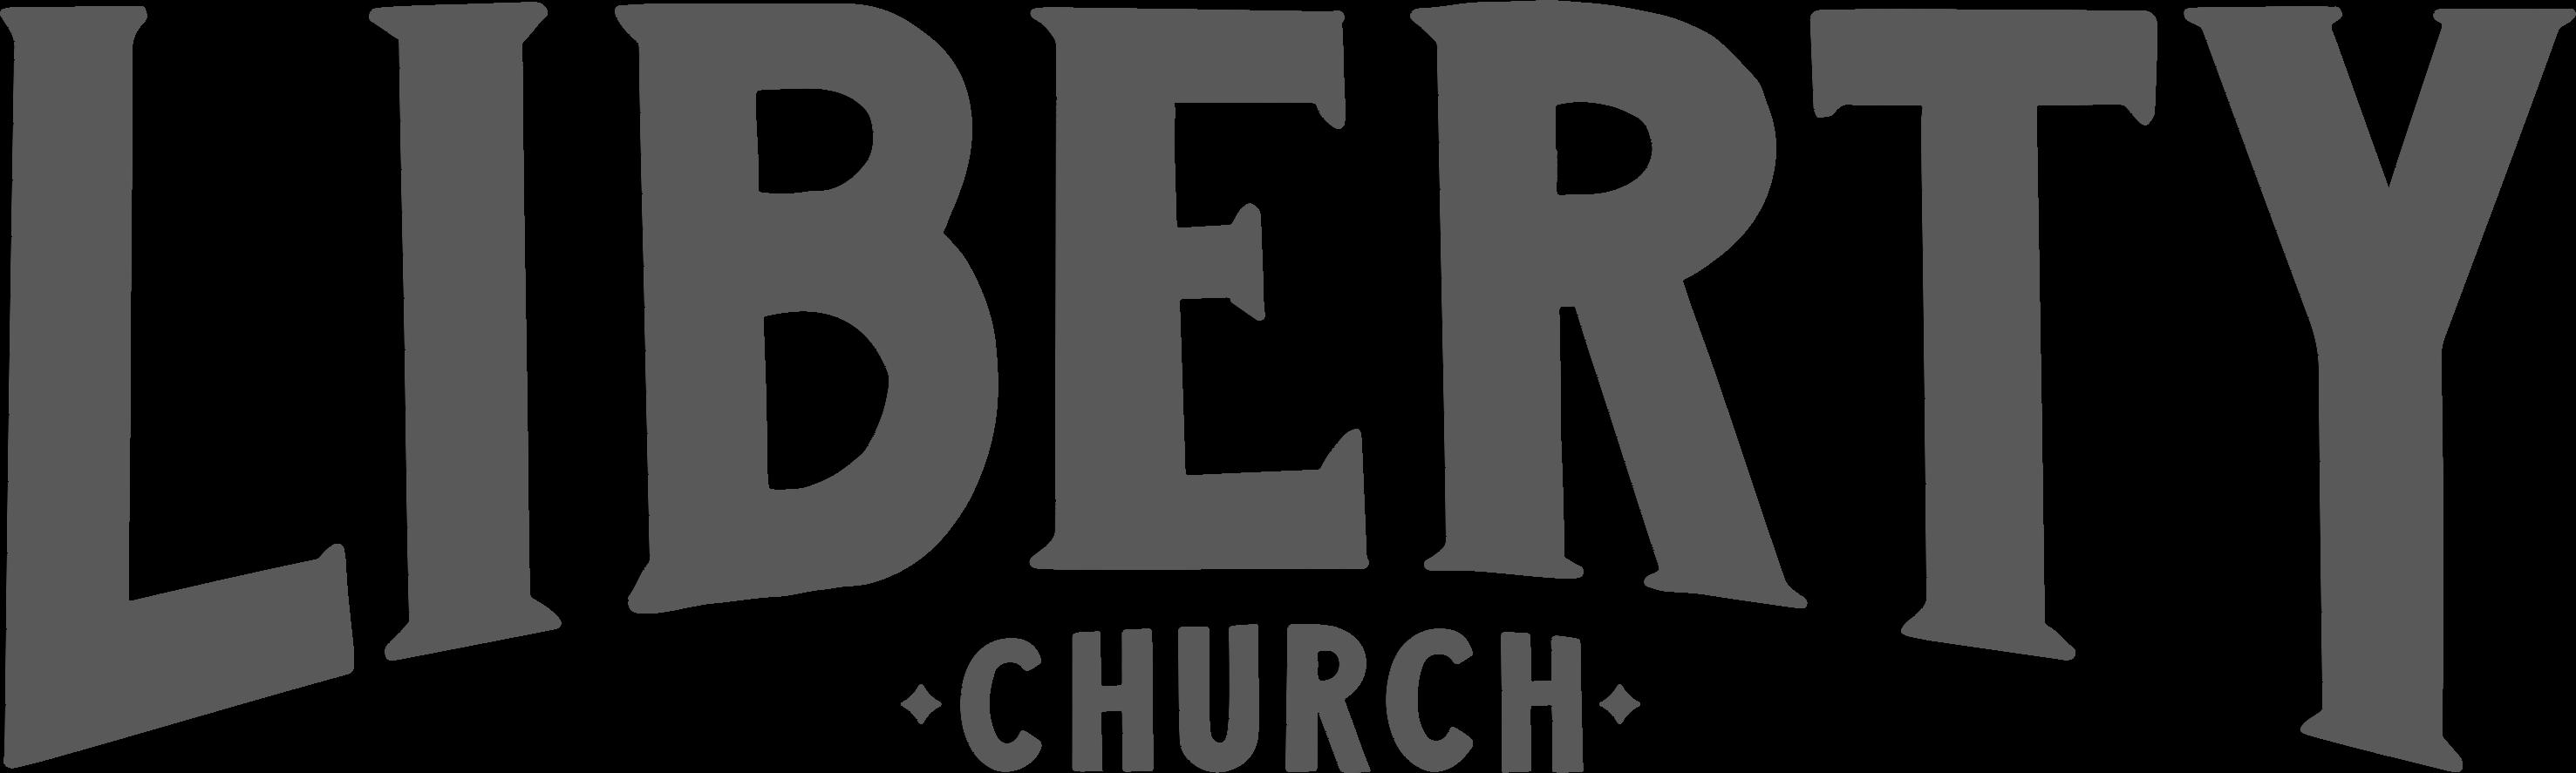 Liberty Church